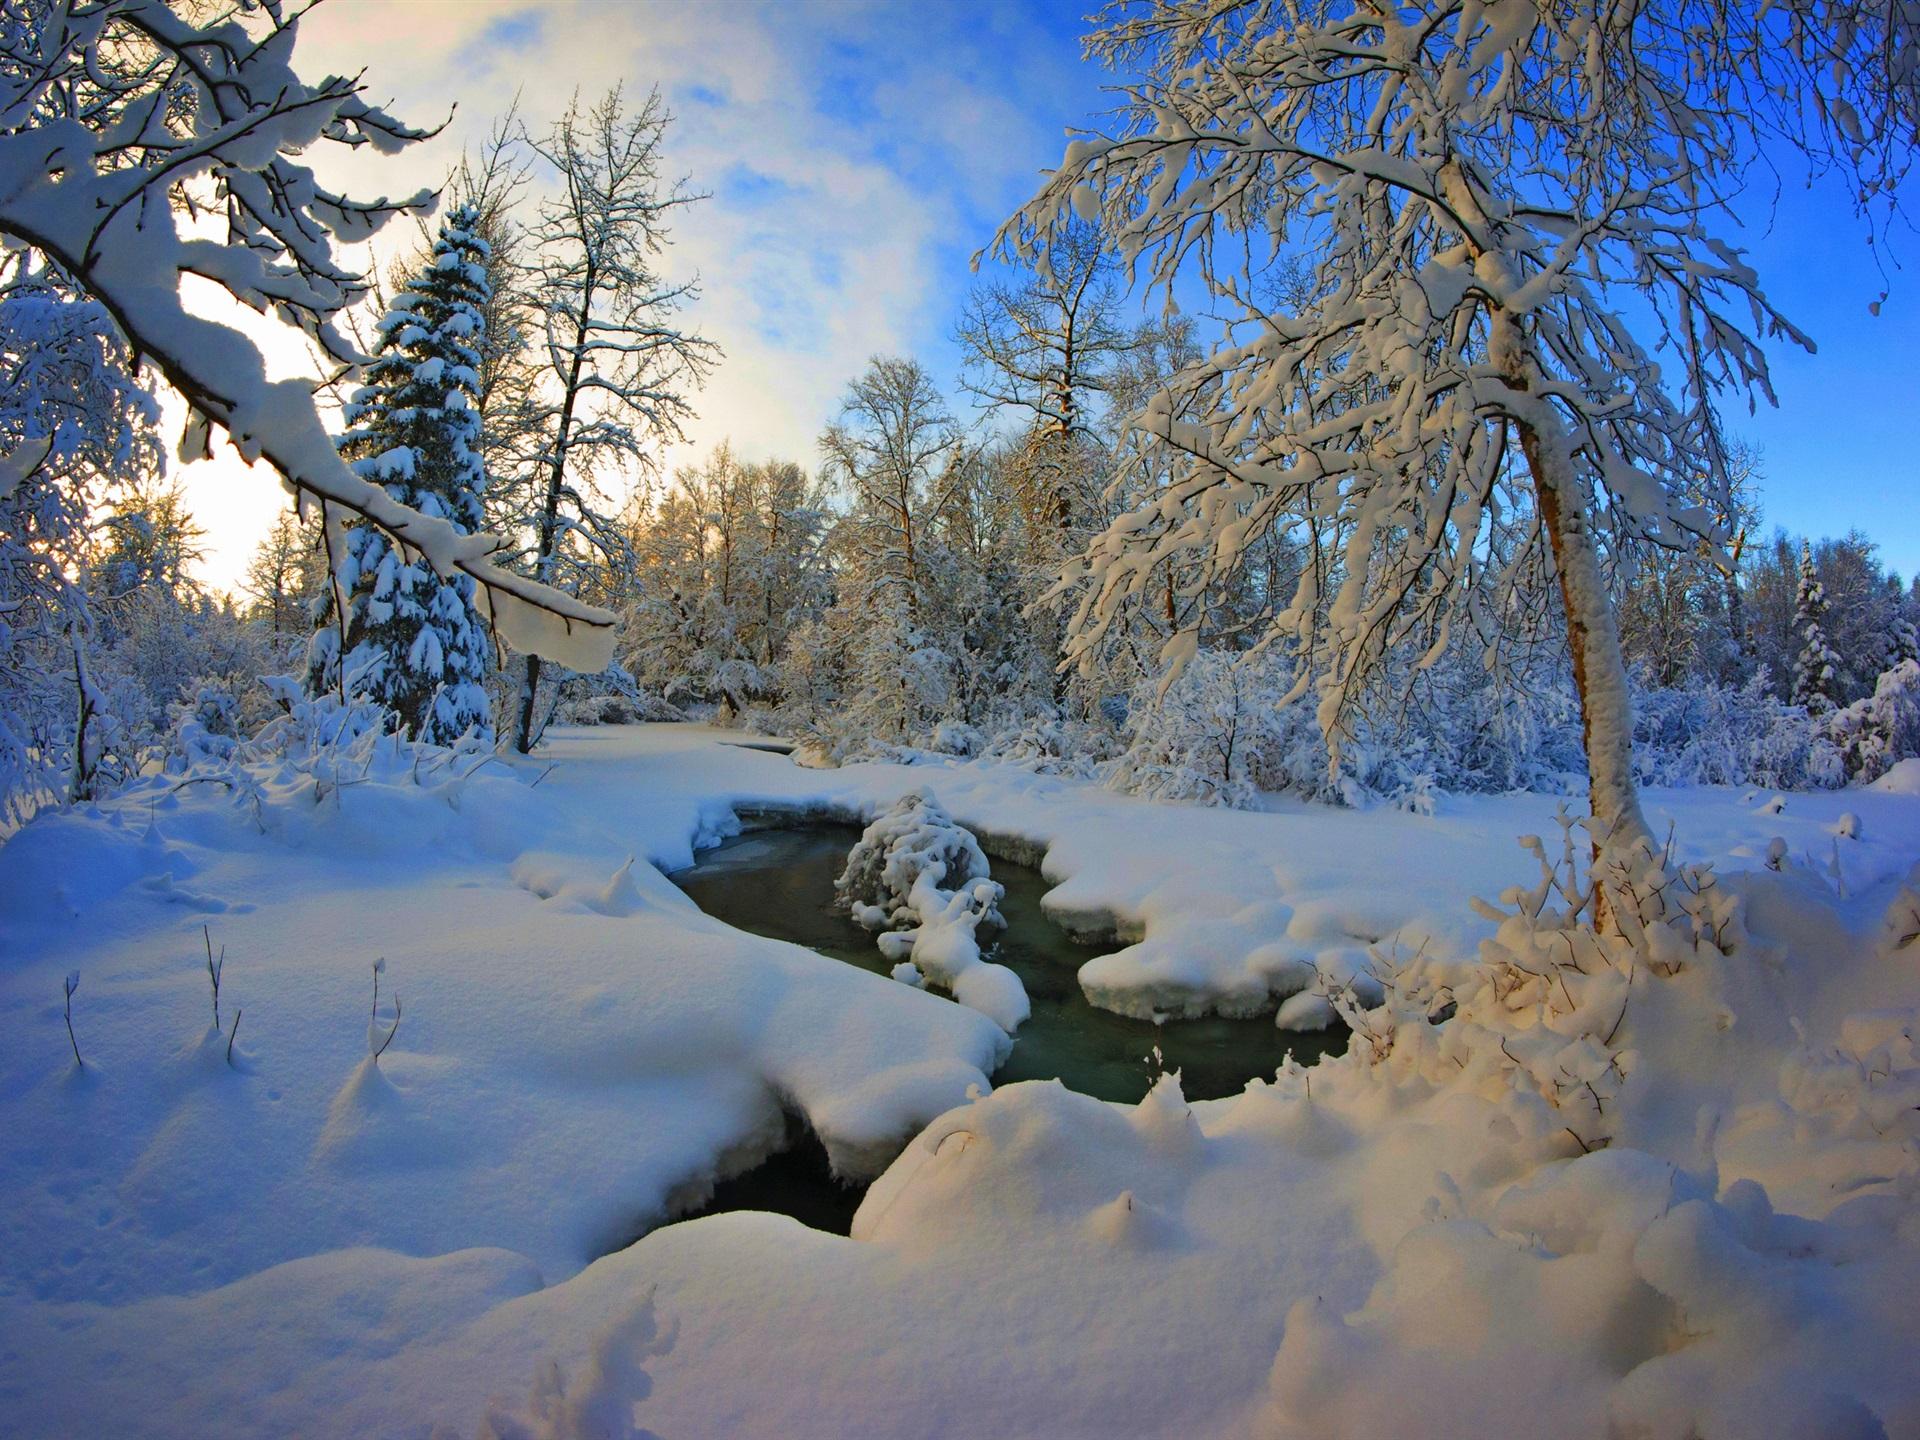 речка зима закат снег бесплатно